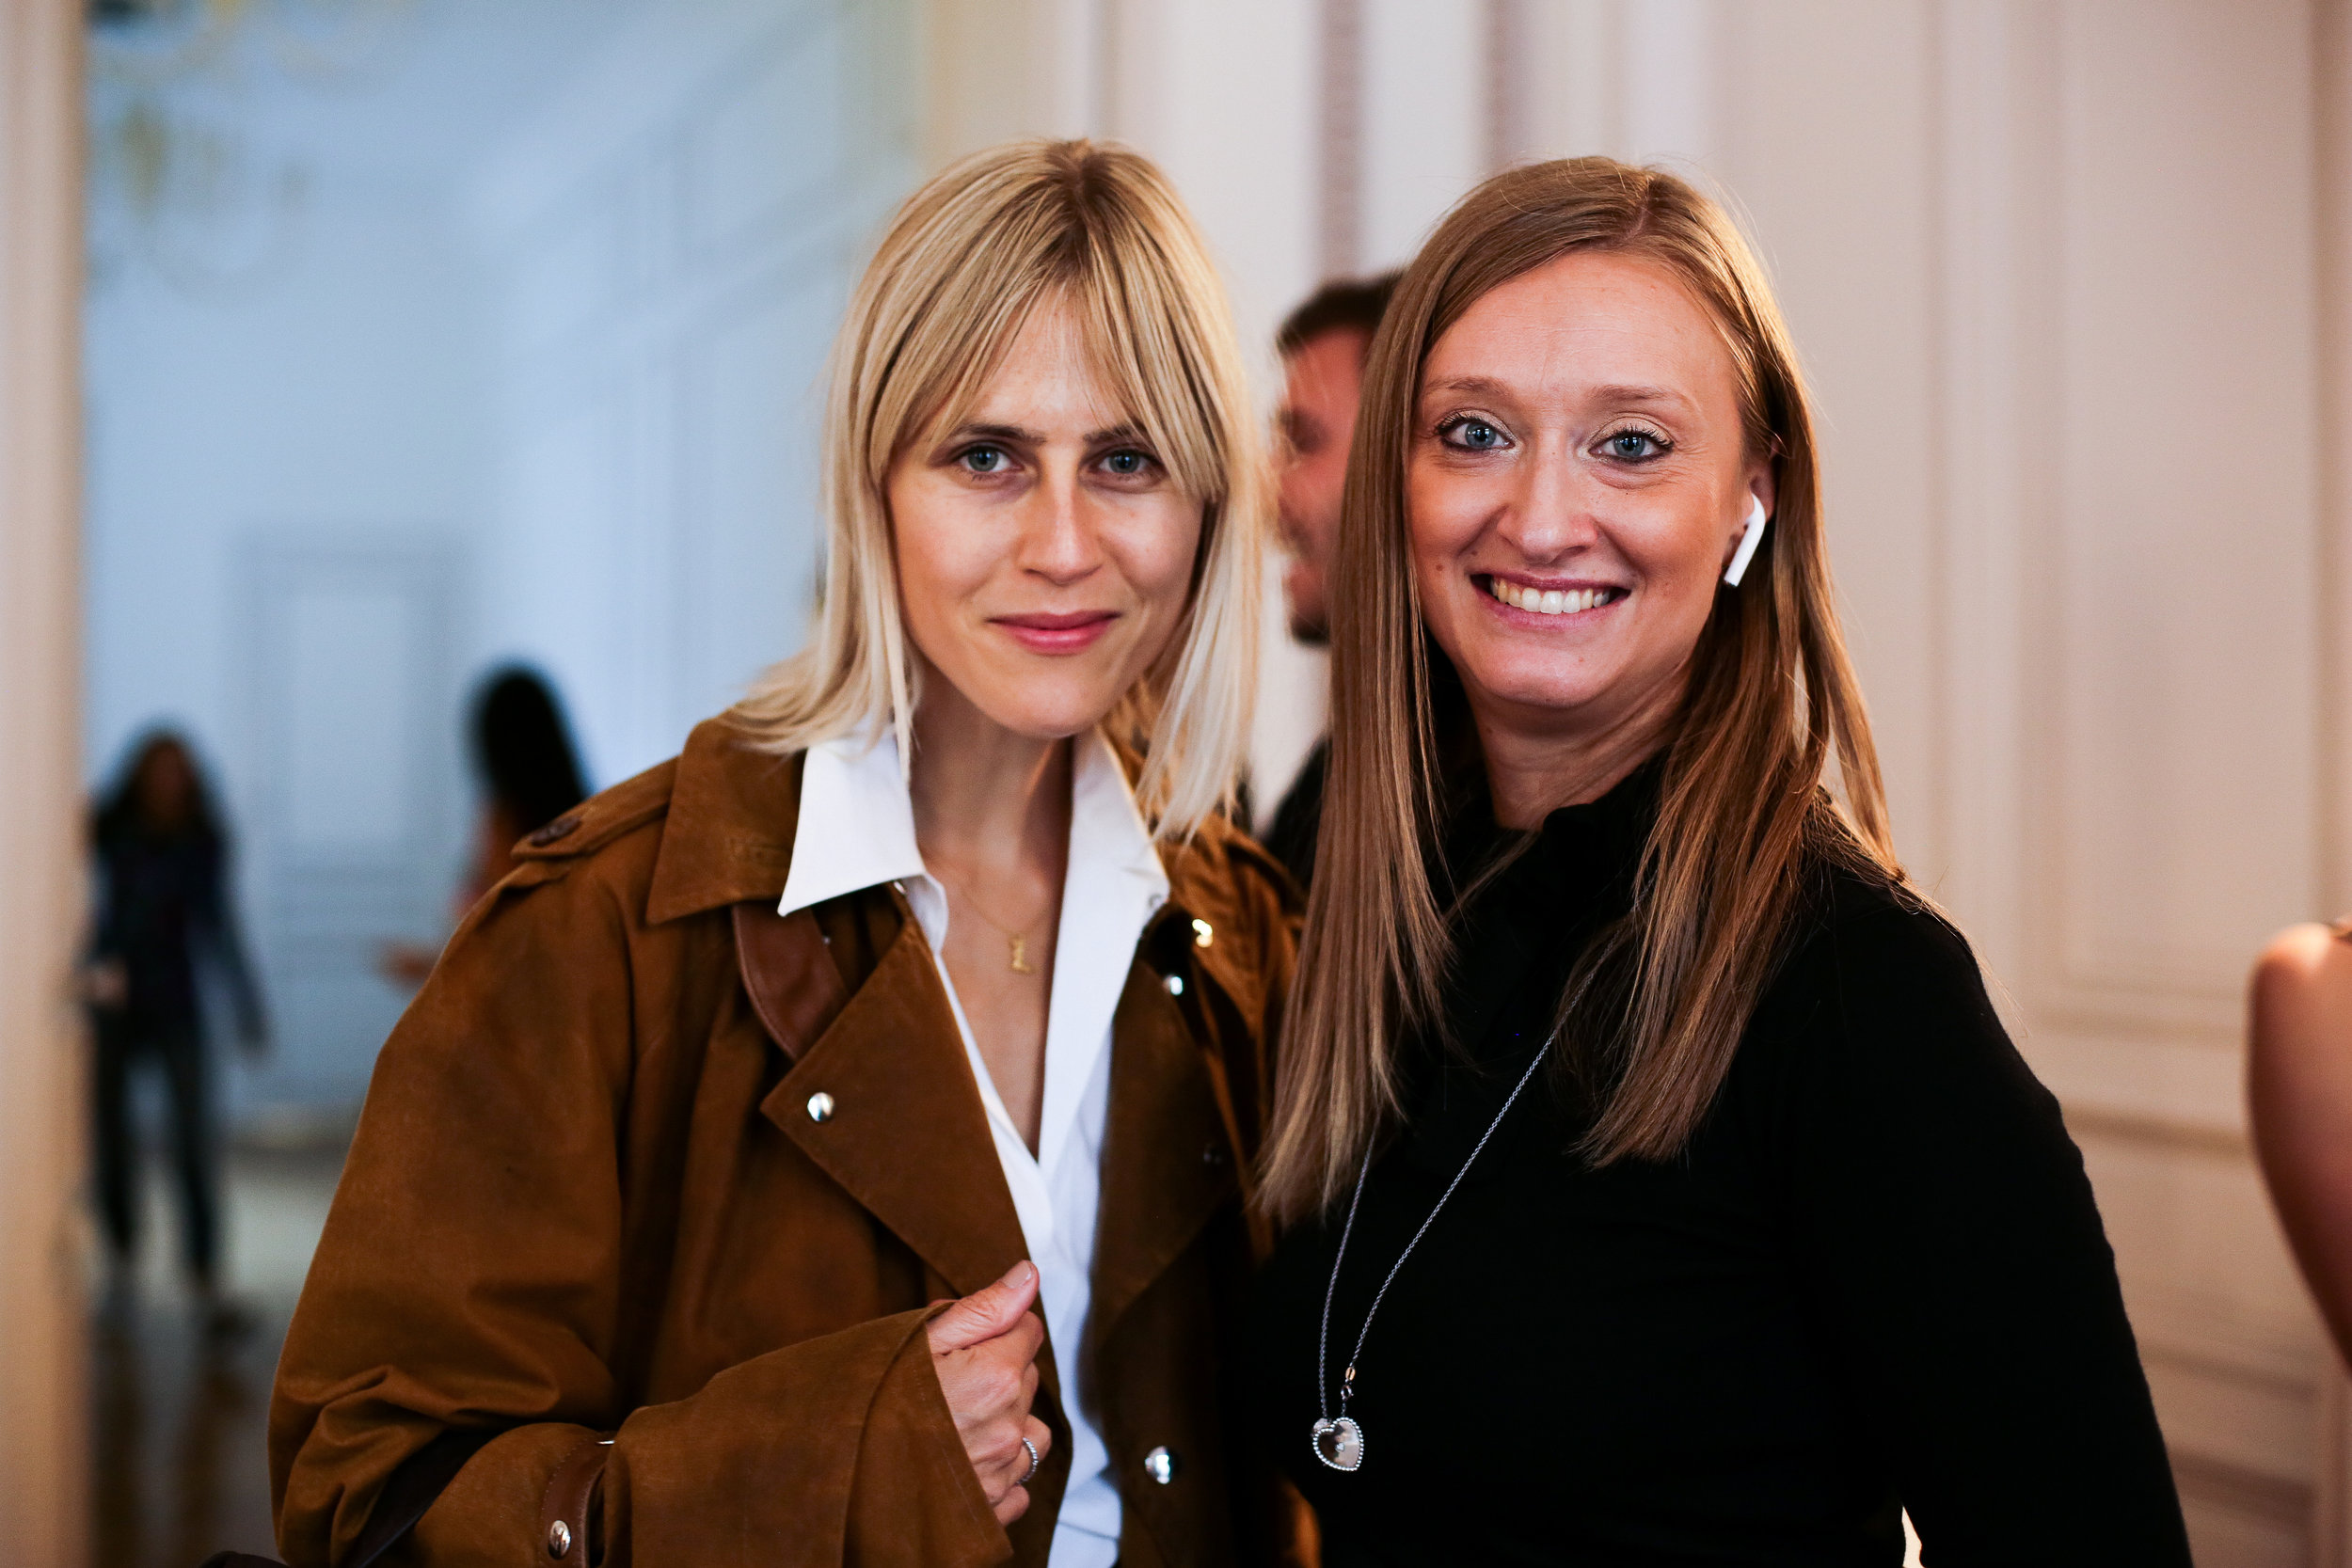 Linda Tol & Francesca Airoldi.jpg